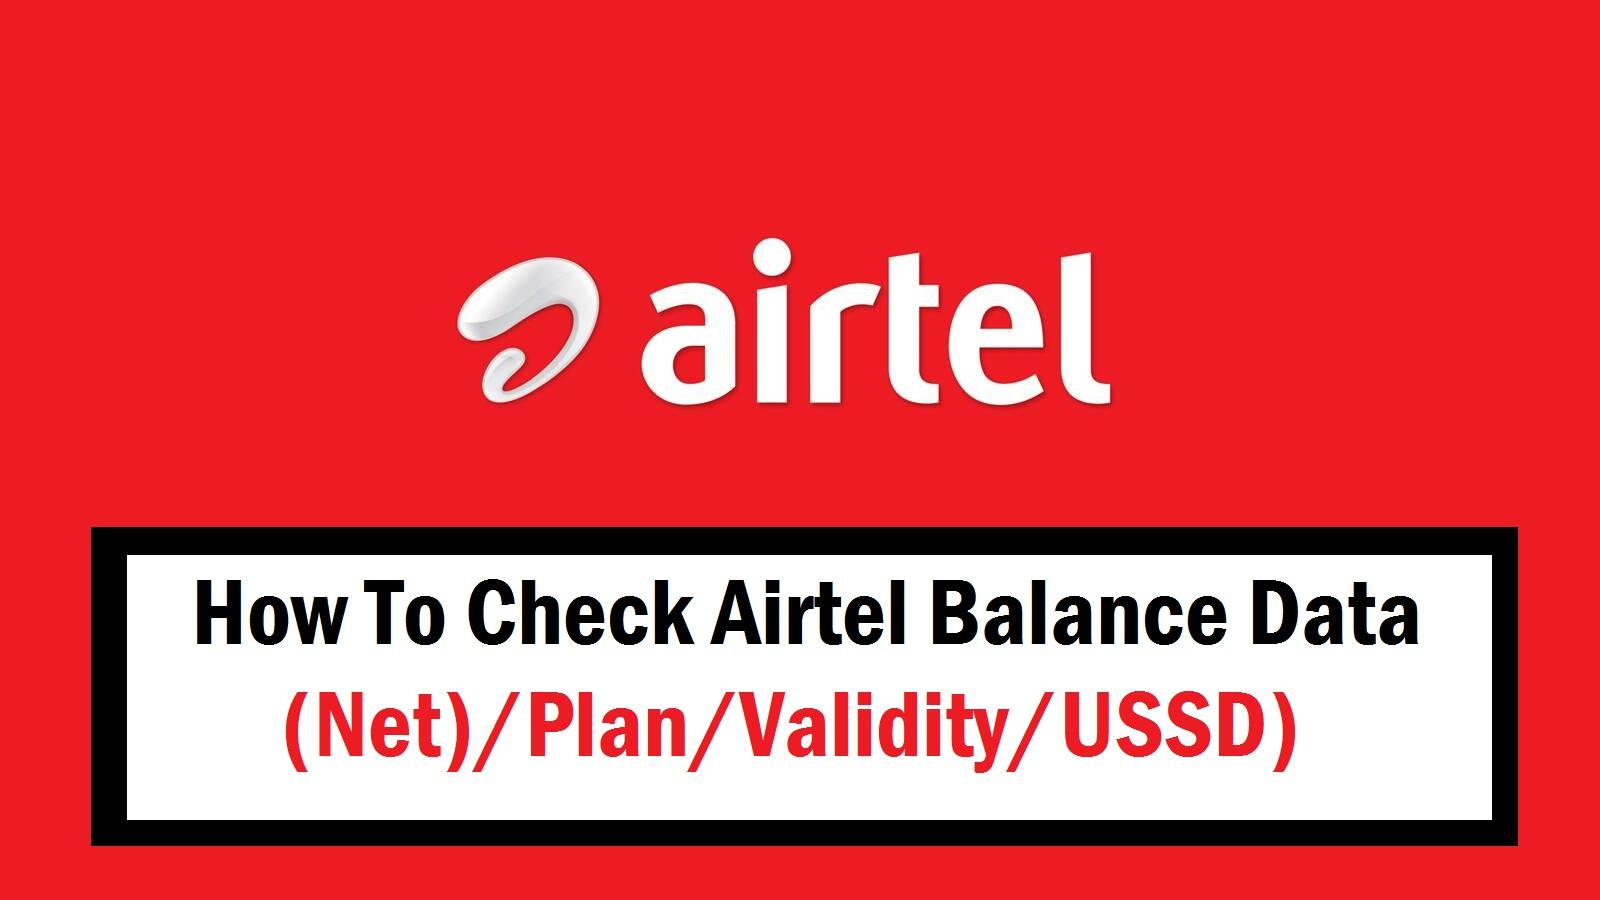 How To Check Airtel Balance Data